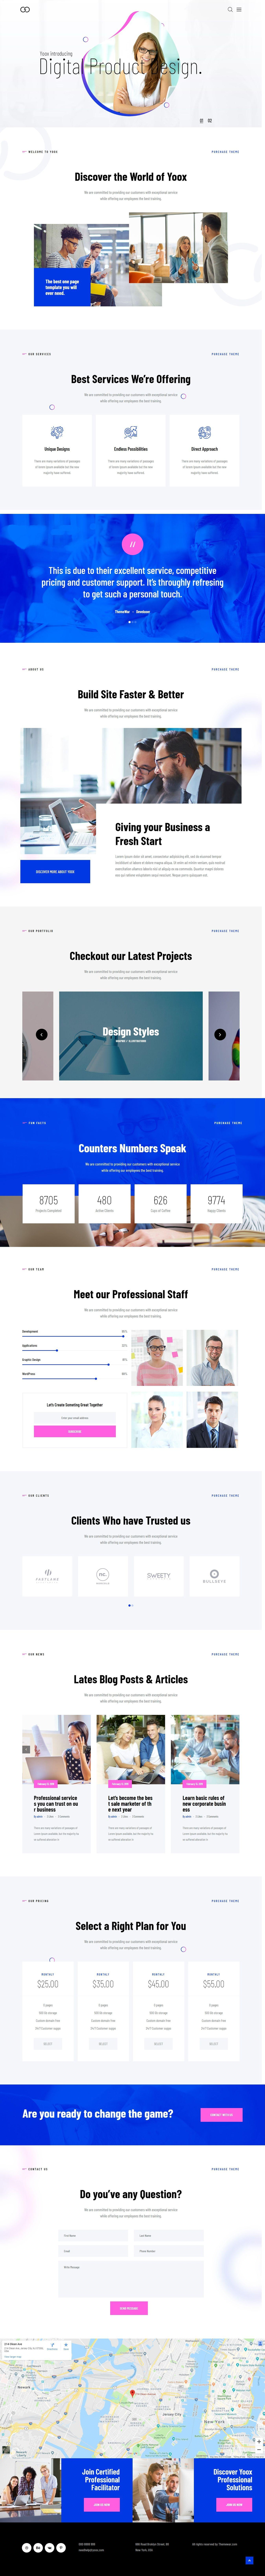 Yoox Creative One Page Parallax Wordpress Theme Pretty Web Design Responsive Theme Creative Wordpress Themes